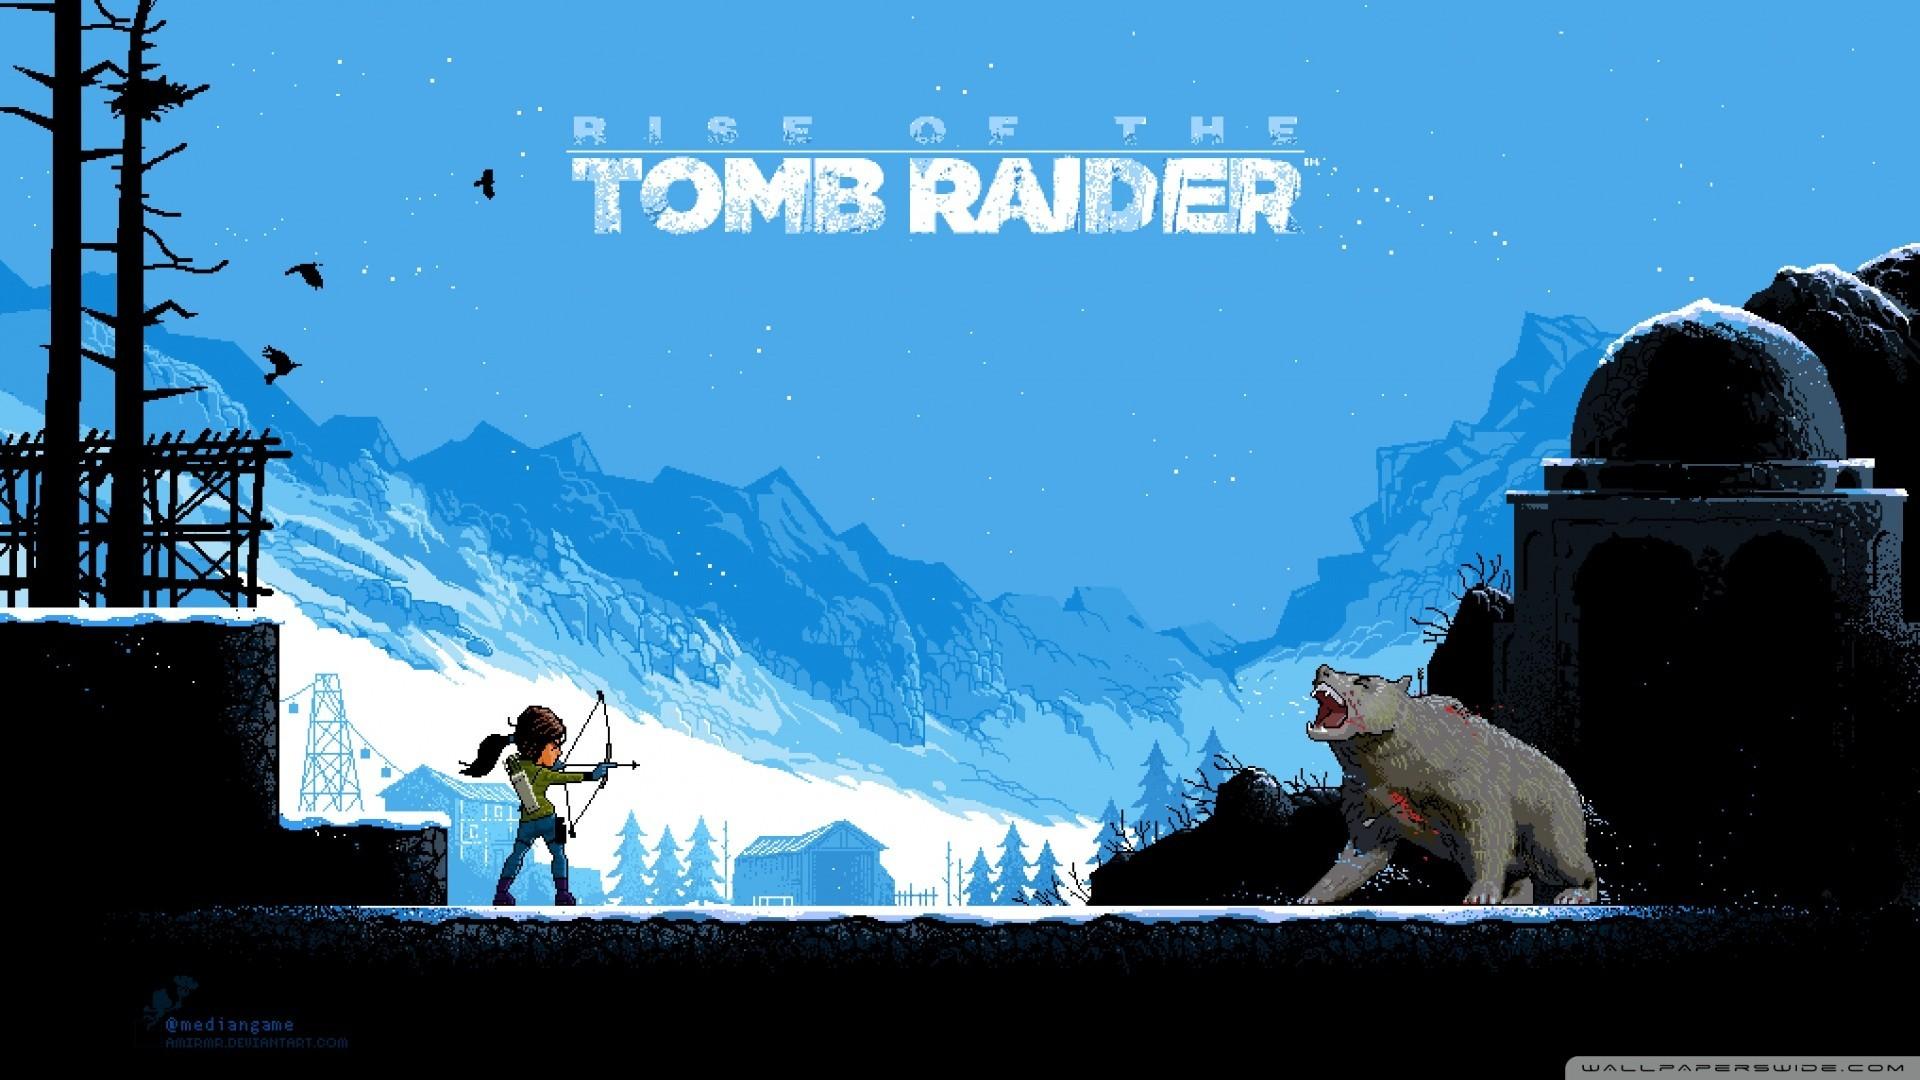 Tomb Raider, Rise Of The Tomb Raider, Pixel Art, Video Games Wallpaper